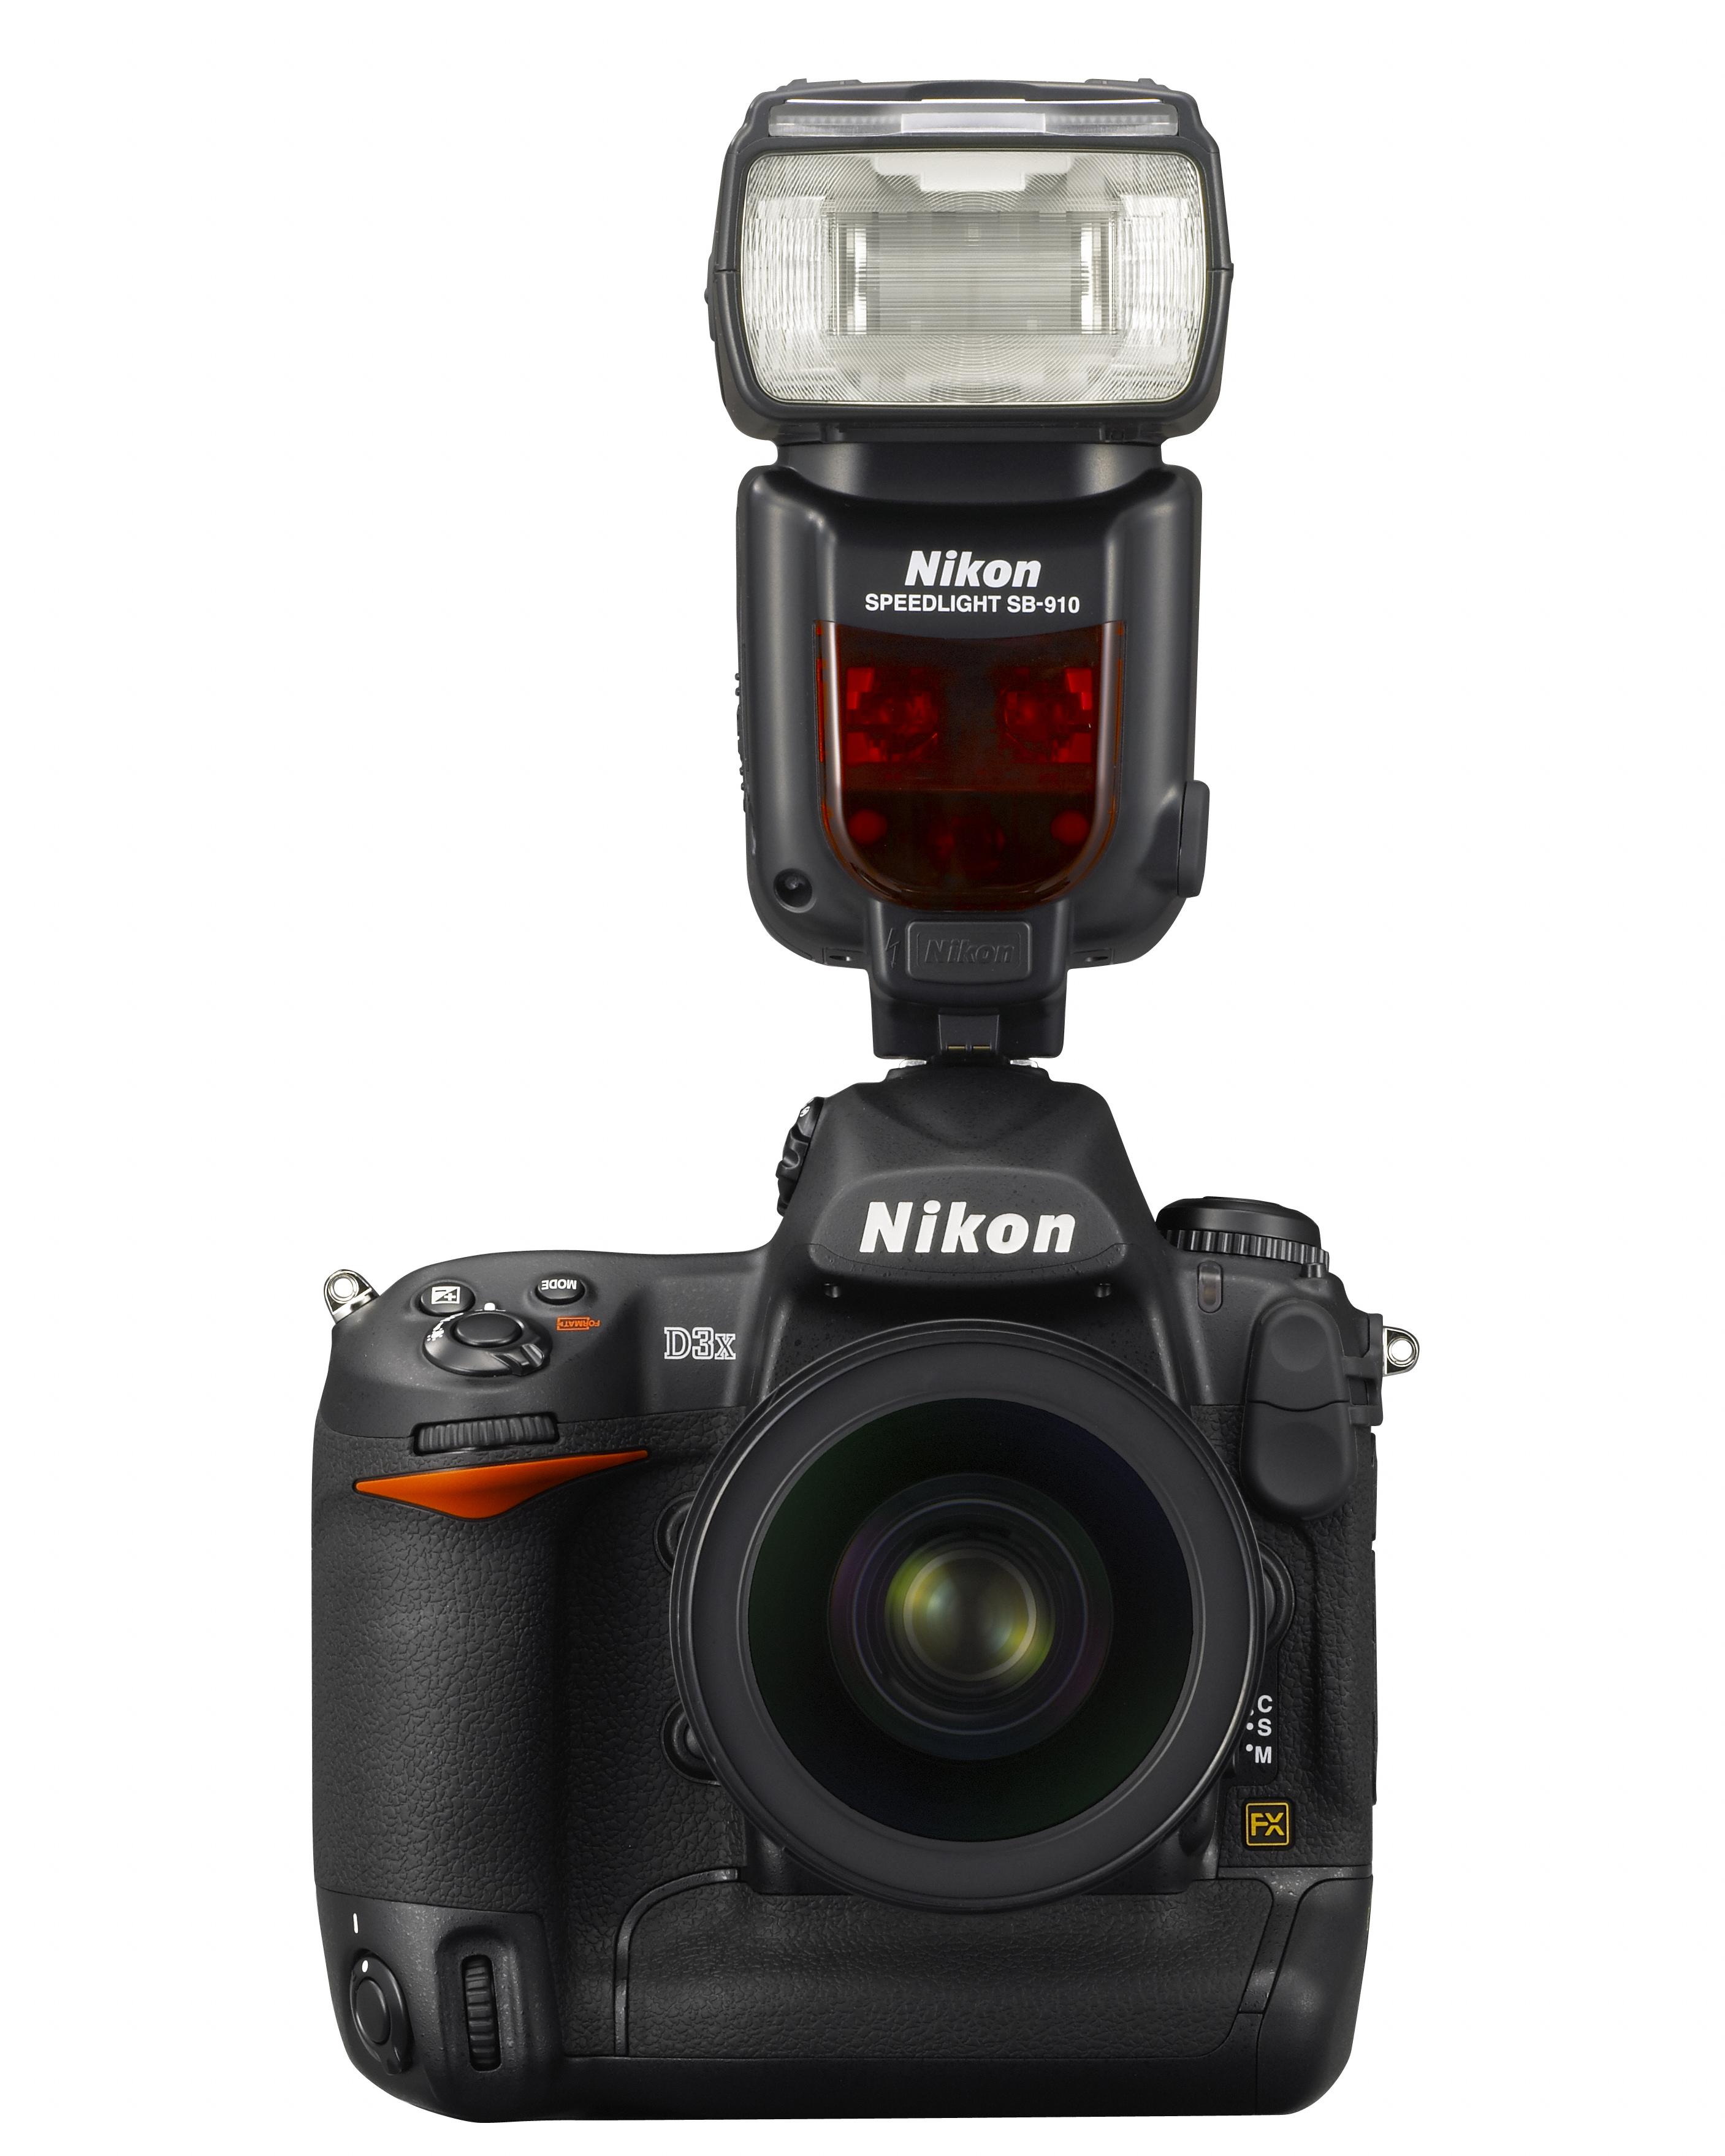 The New Nikon Sb 910 Speedlight Harnesses Powerful